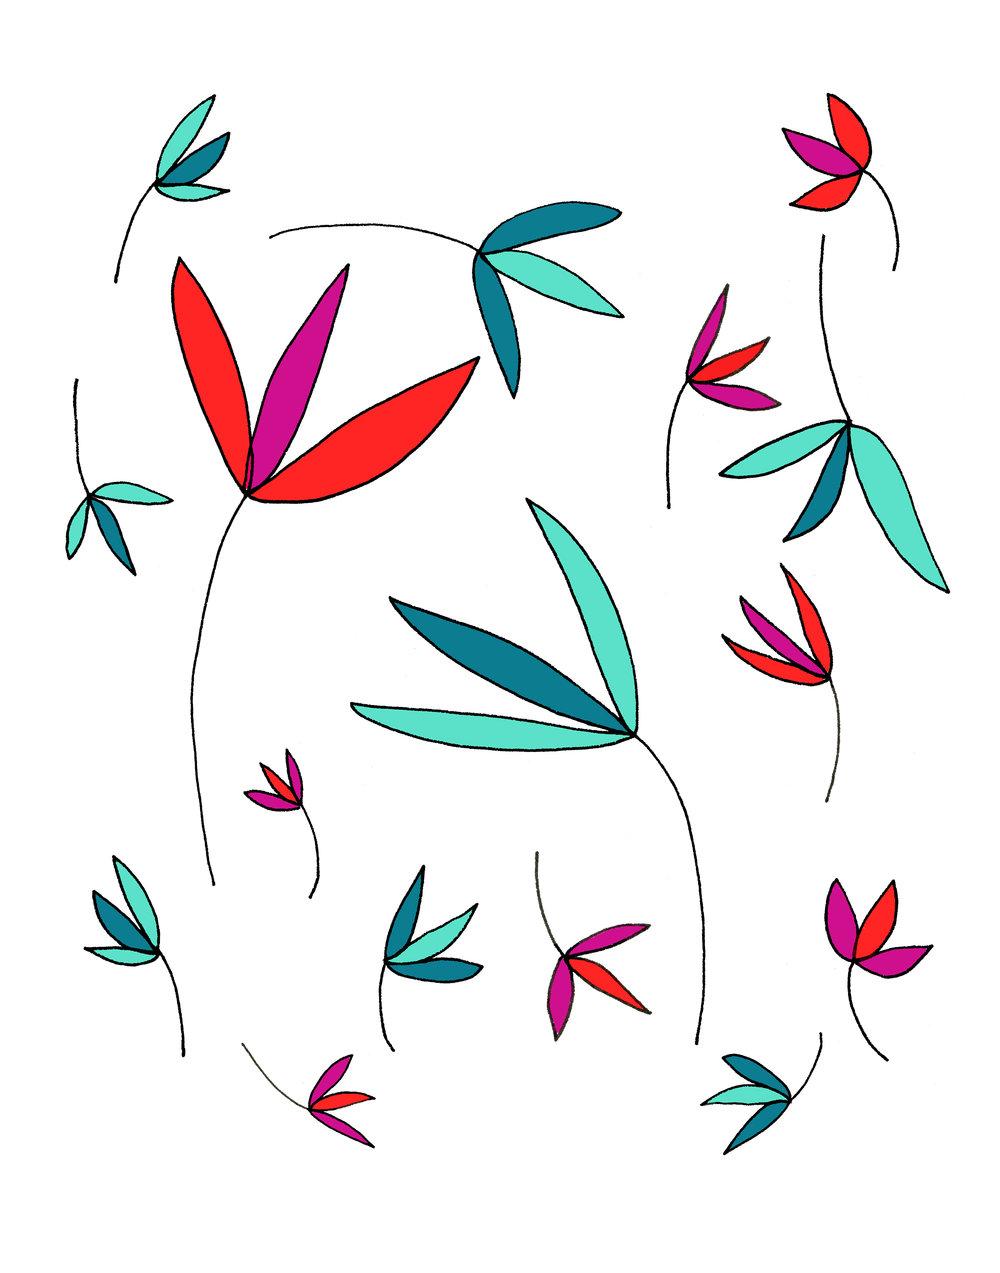 Plant Illustration by Emma Freeman Designs